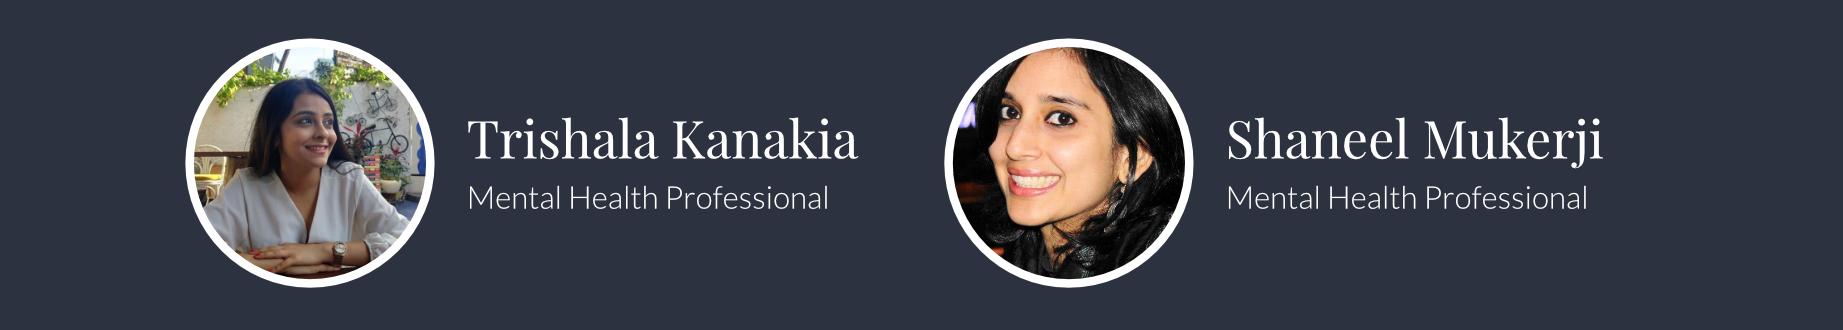 Facilitated By Trishala Kanakia, Saneel Mukerji who are both Mental Health Professionals